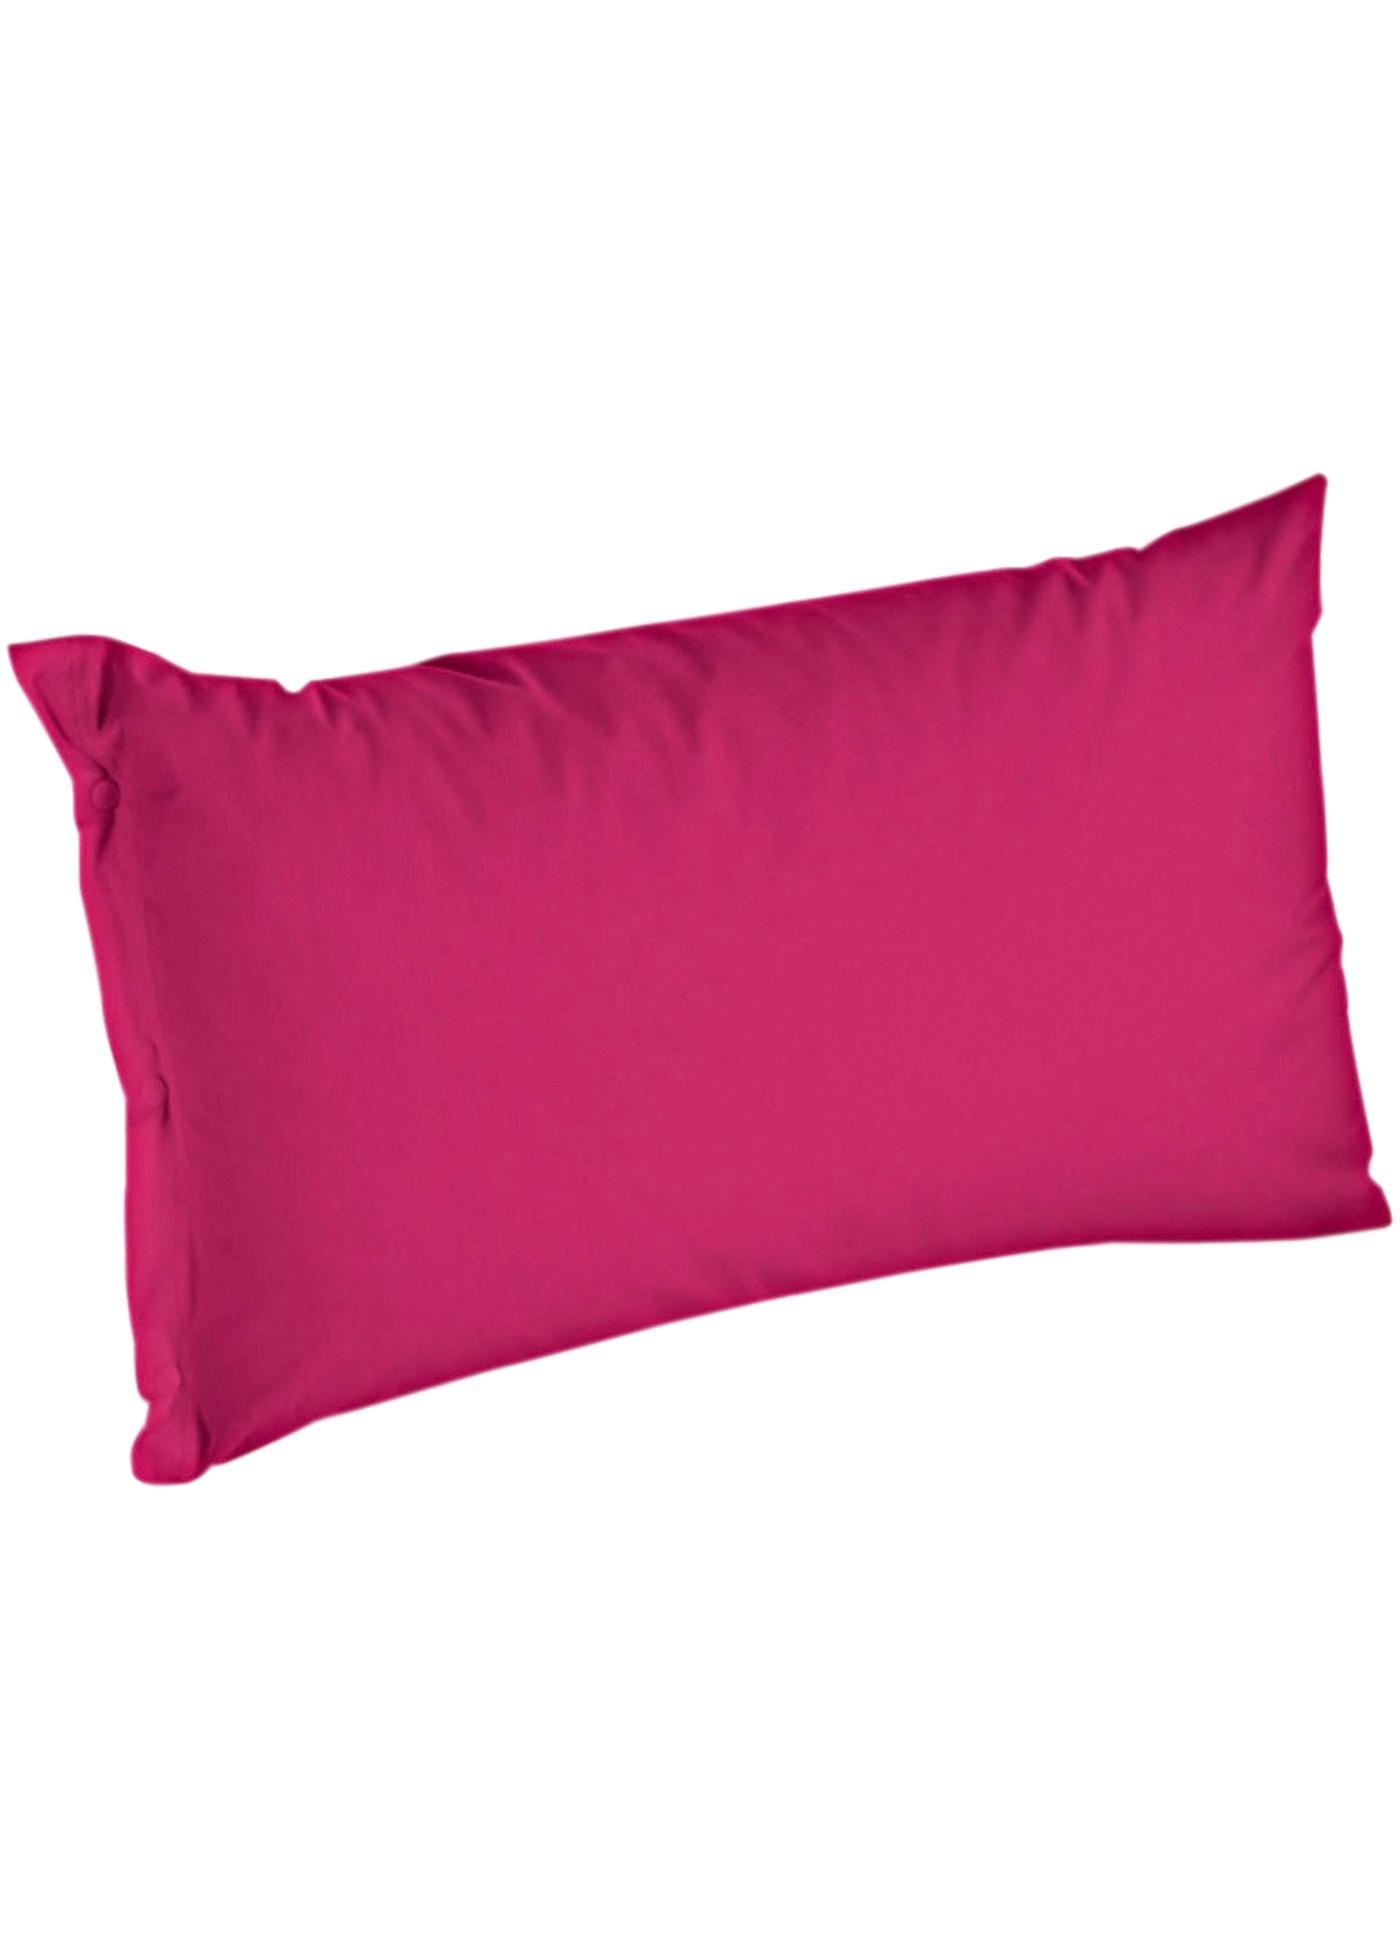 Lenzuola colorate (viola) - Euronova